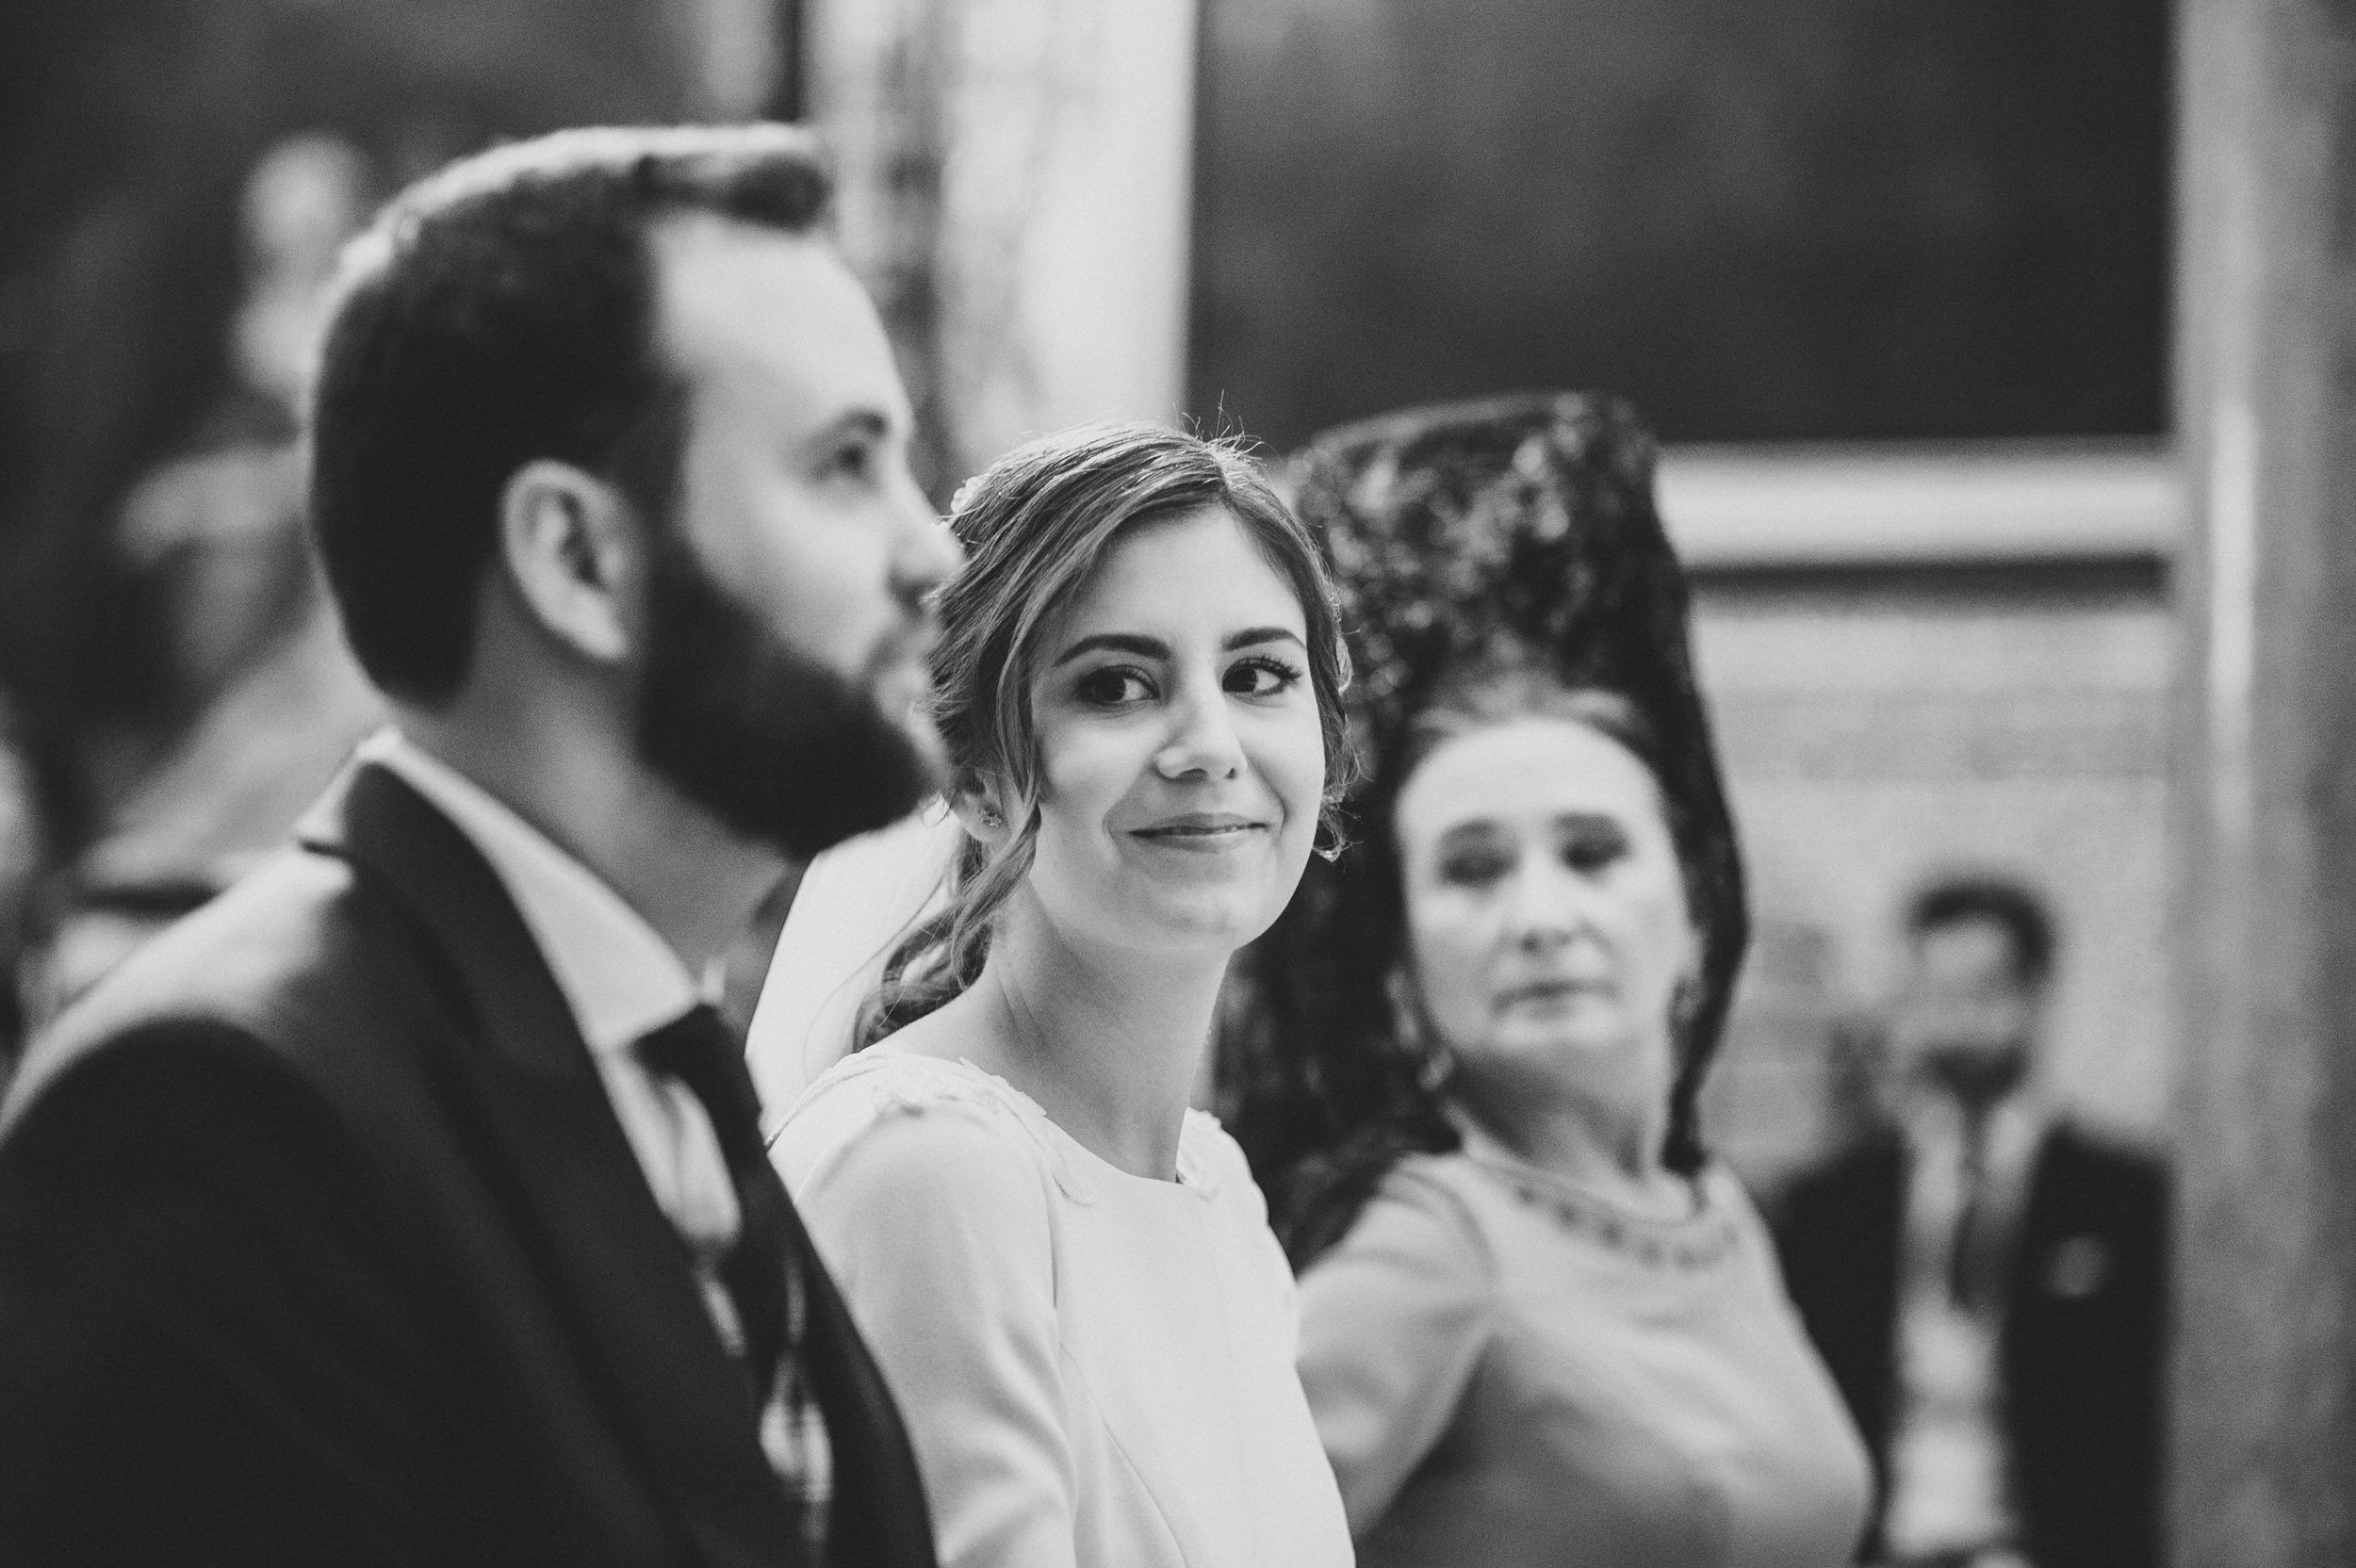 andres+amarillo+fotografo+boda+sevilla+santa+maria+de+la+blanca+al+yamanah (34).JPG